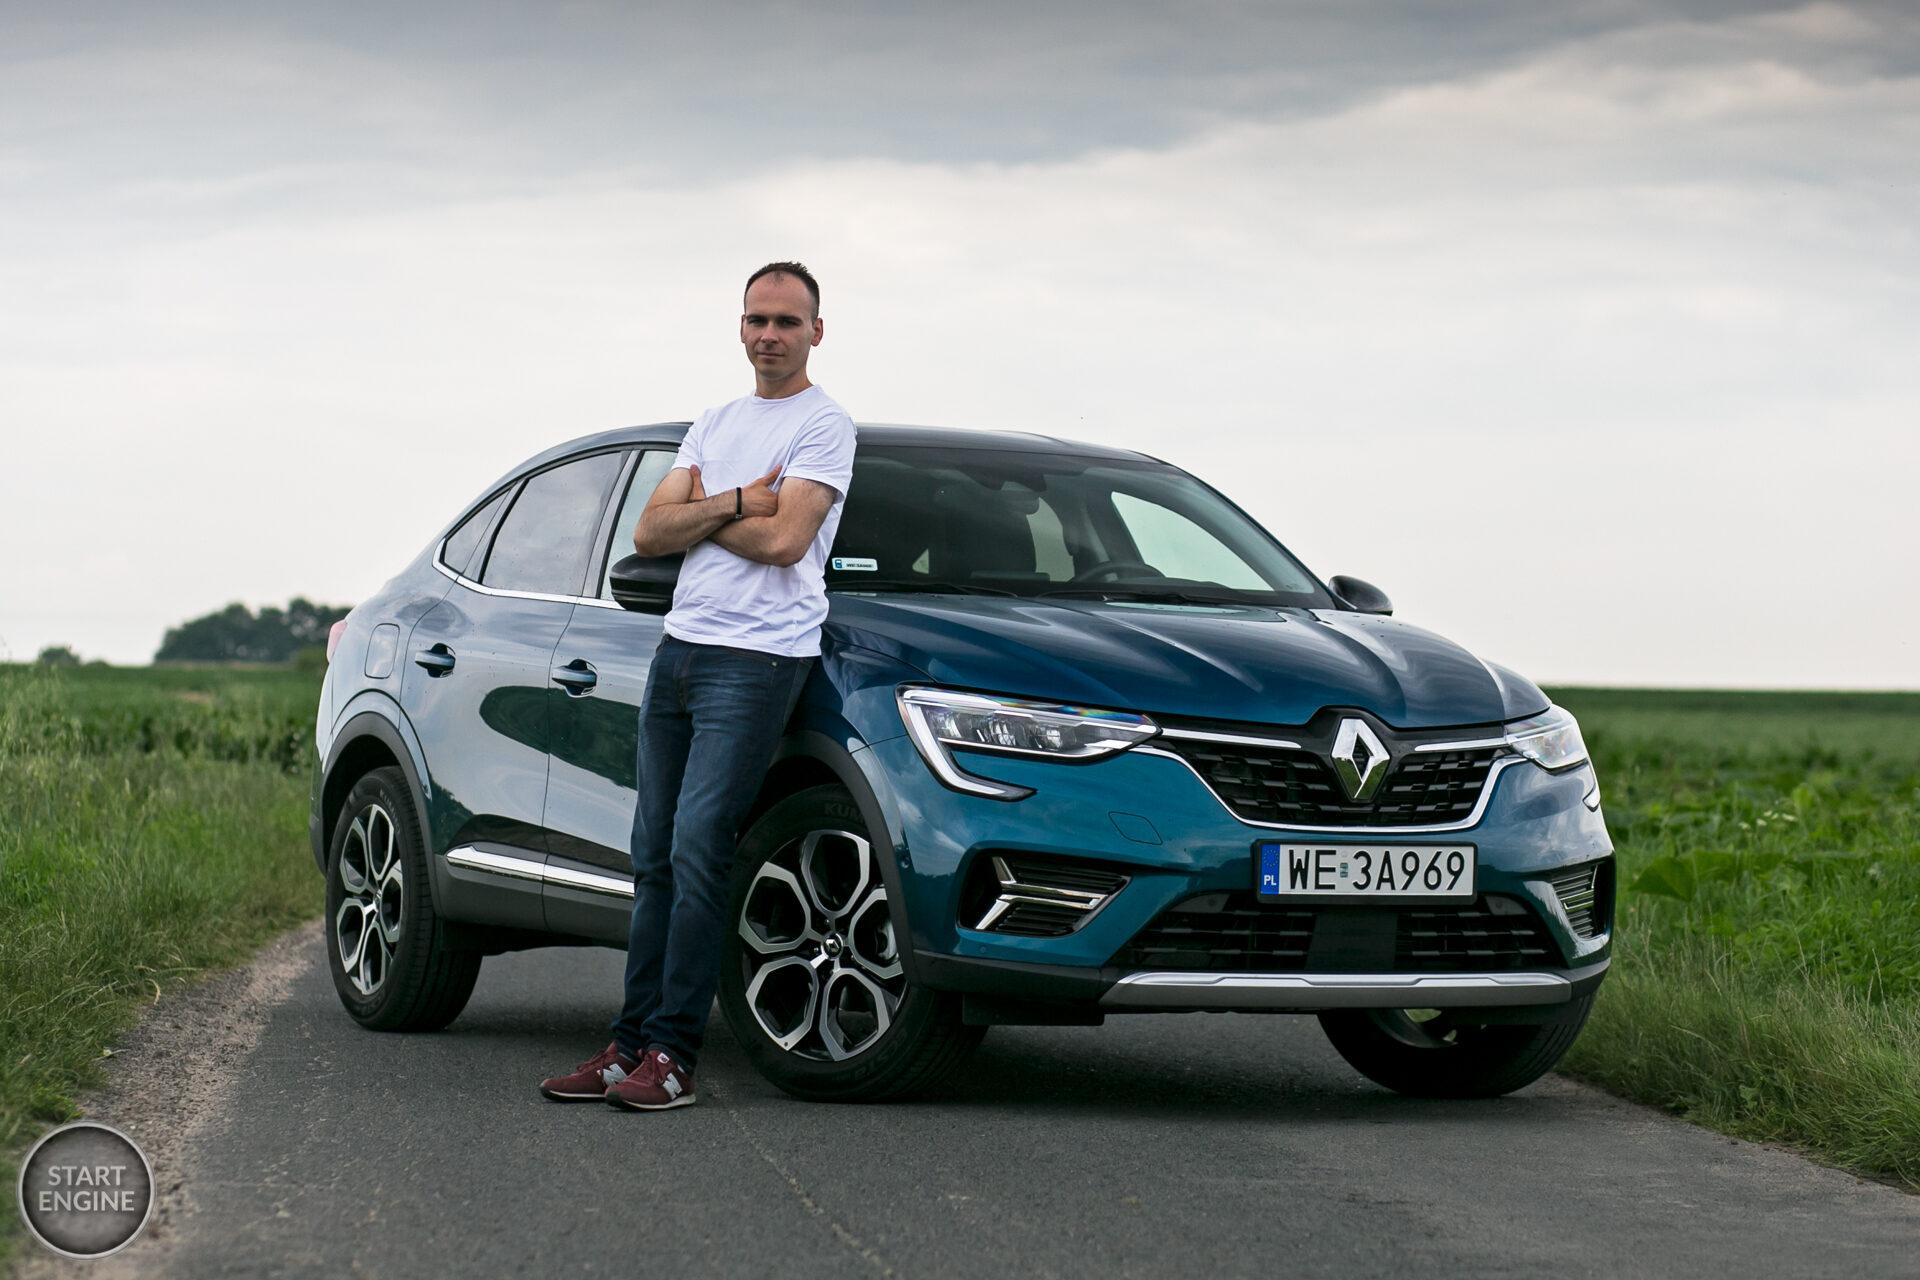 Renault Arkana Intens 1.3 TCe 140 KM EDC